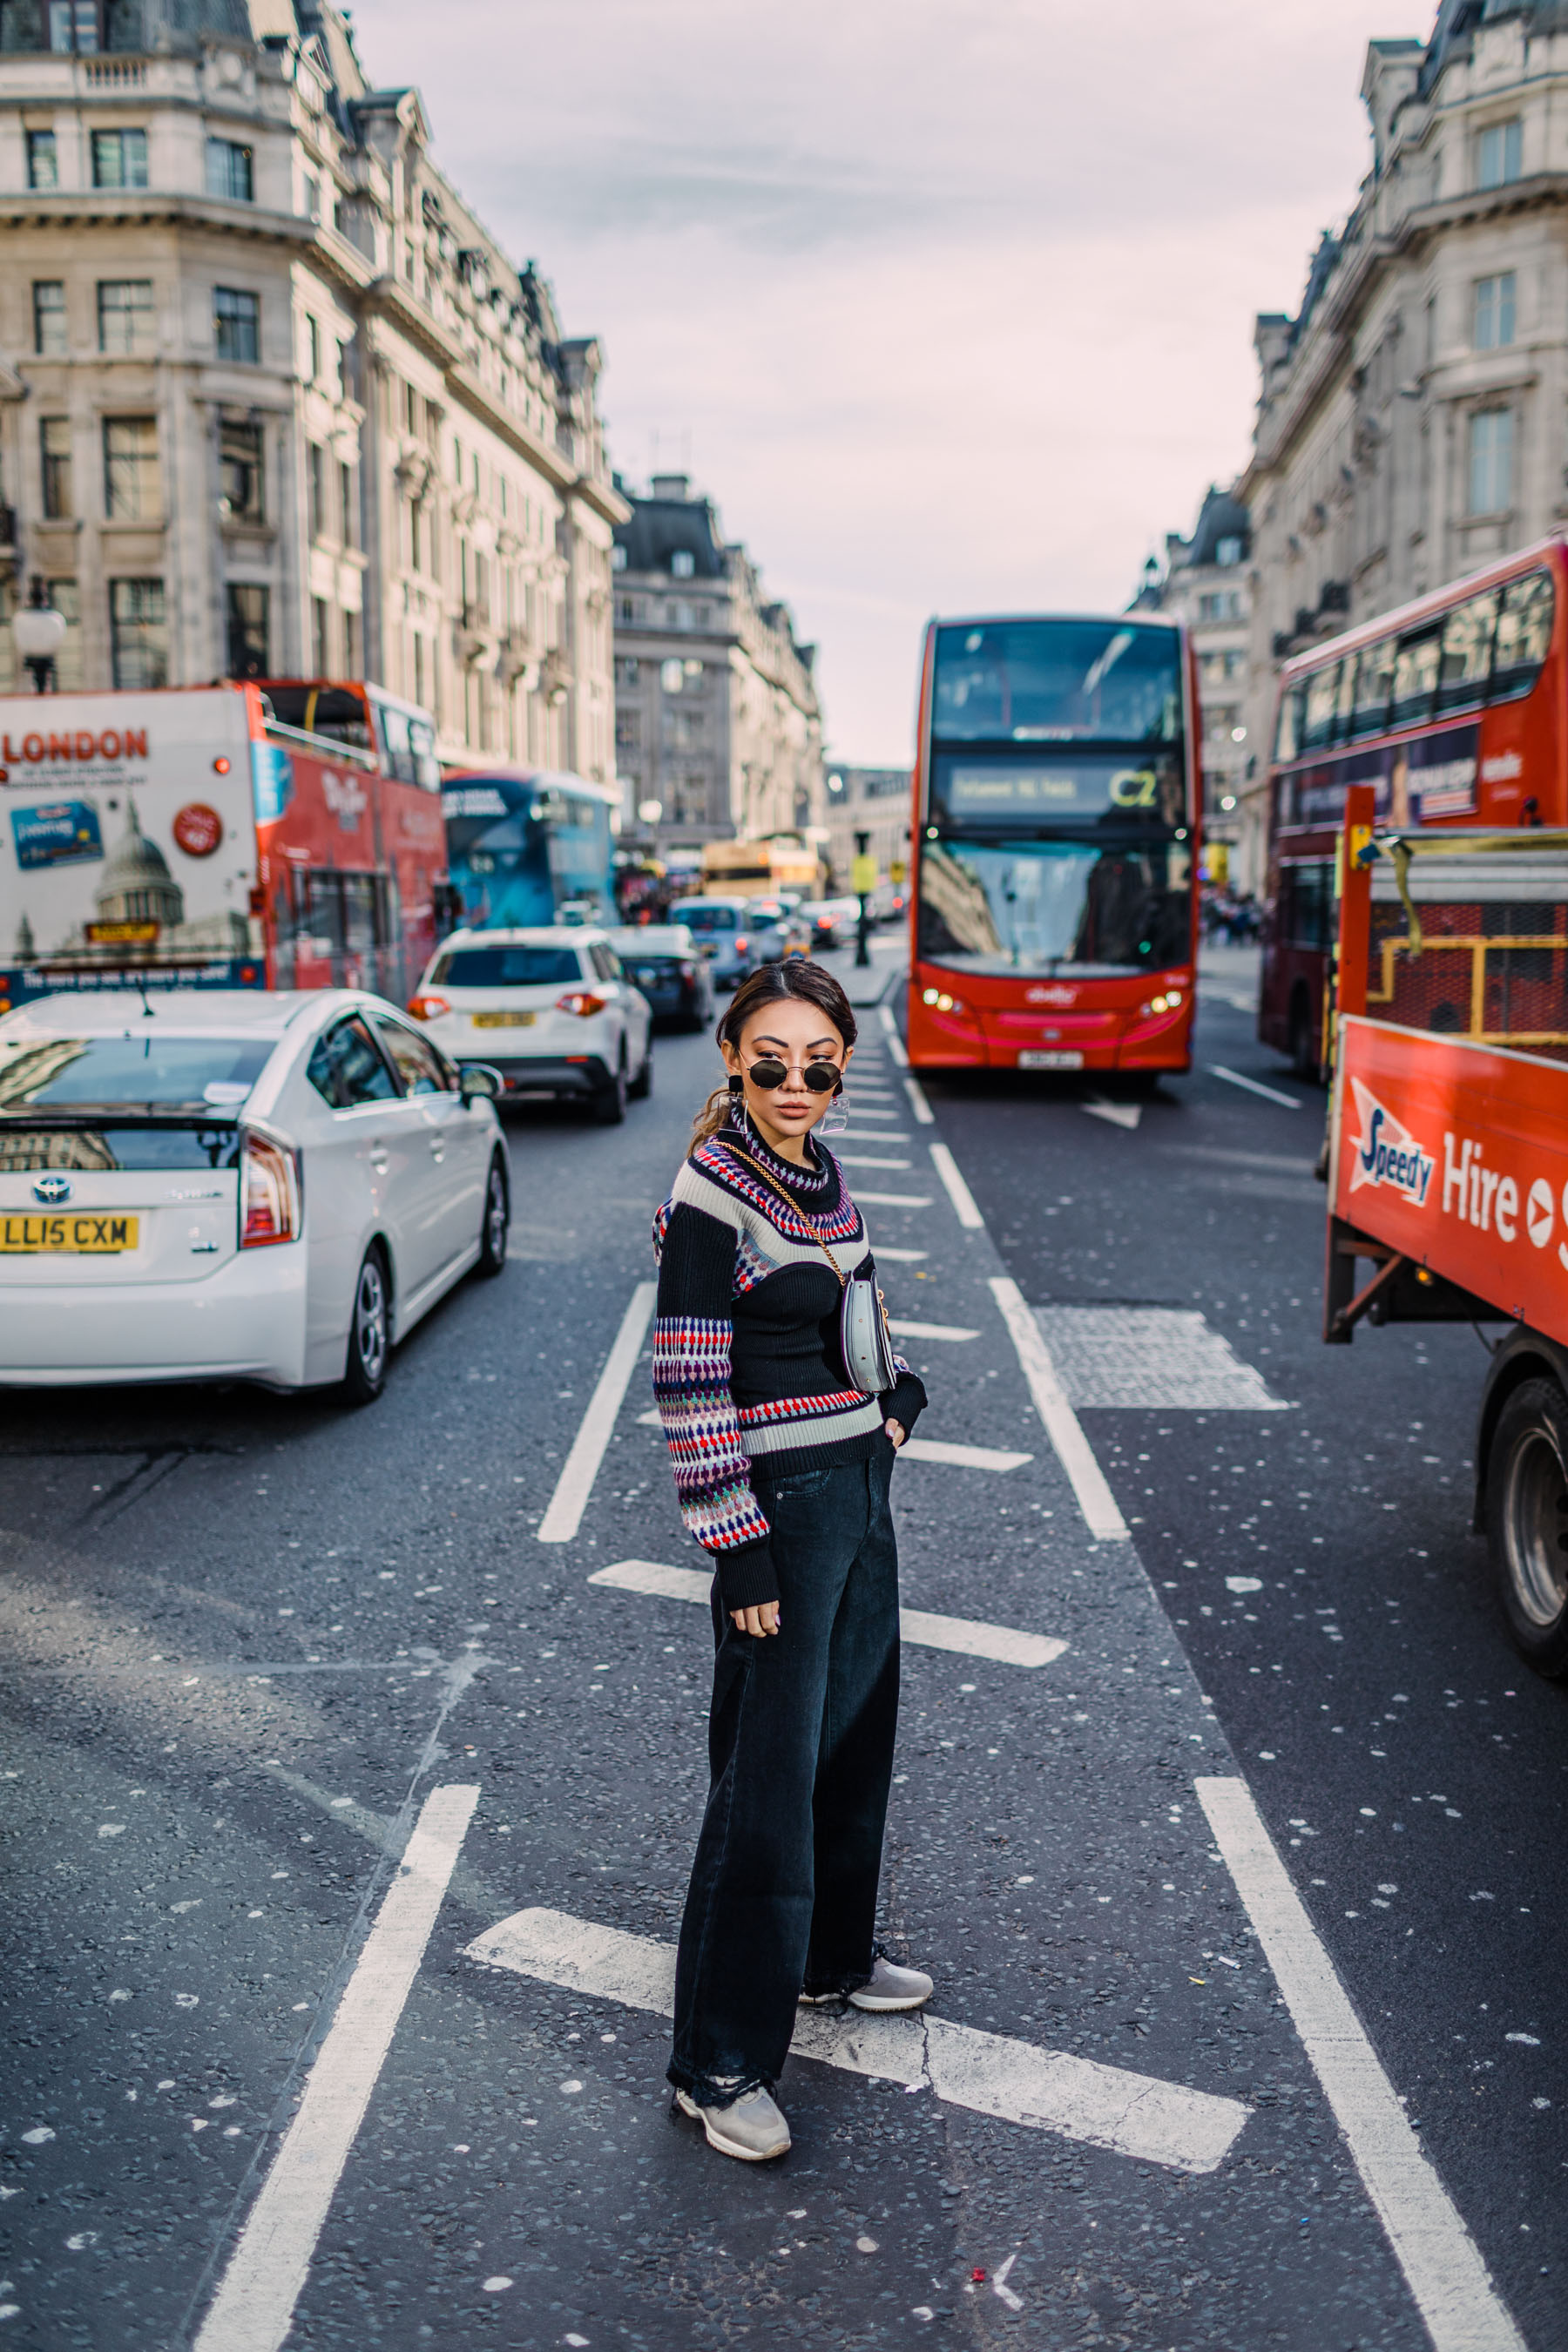 London Fashion Week Recap - Burberry Intarsia Sweater, Wide Leg Raw Hem Jeans // Notjessfashion.com